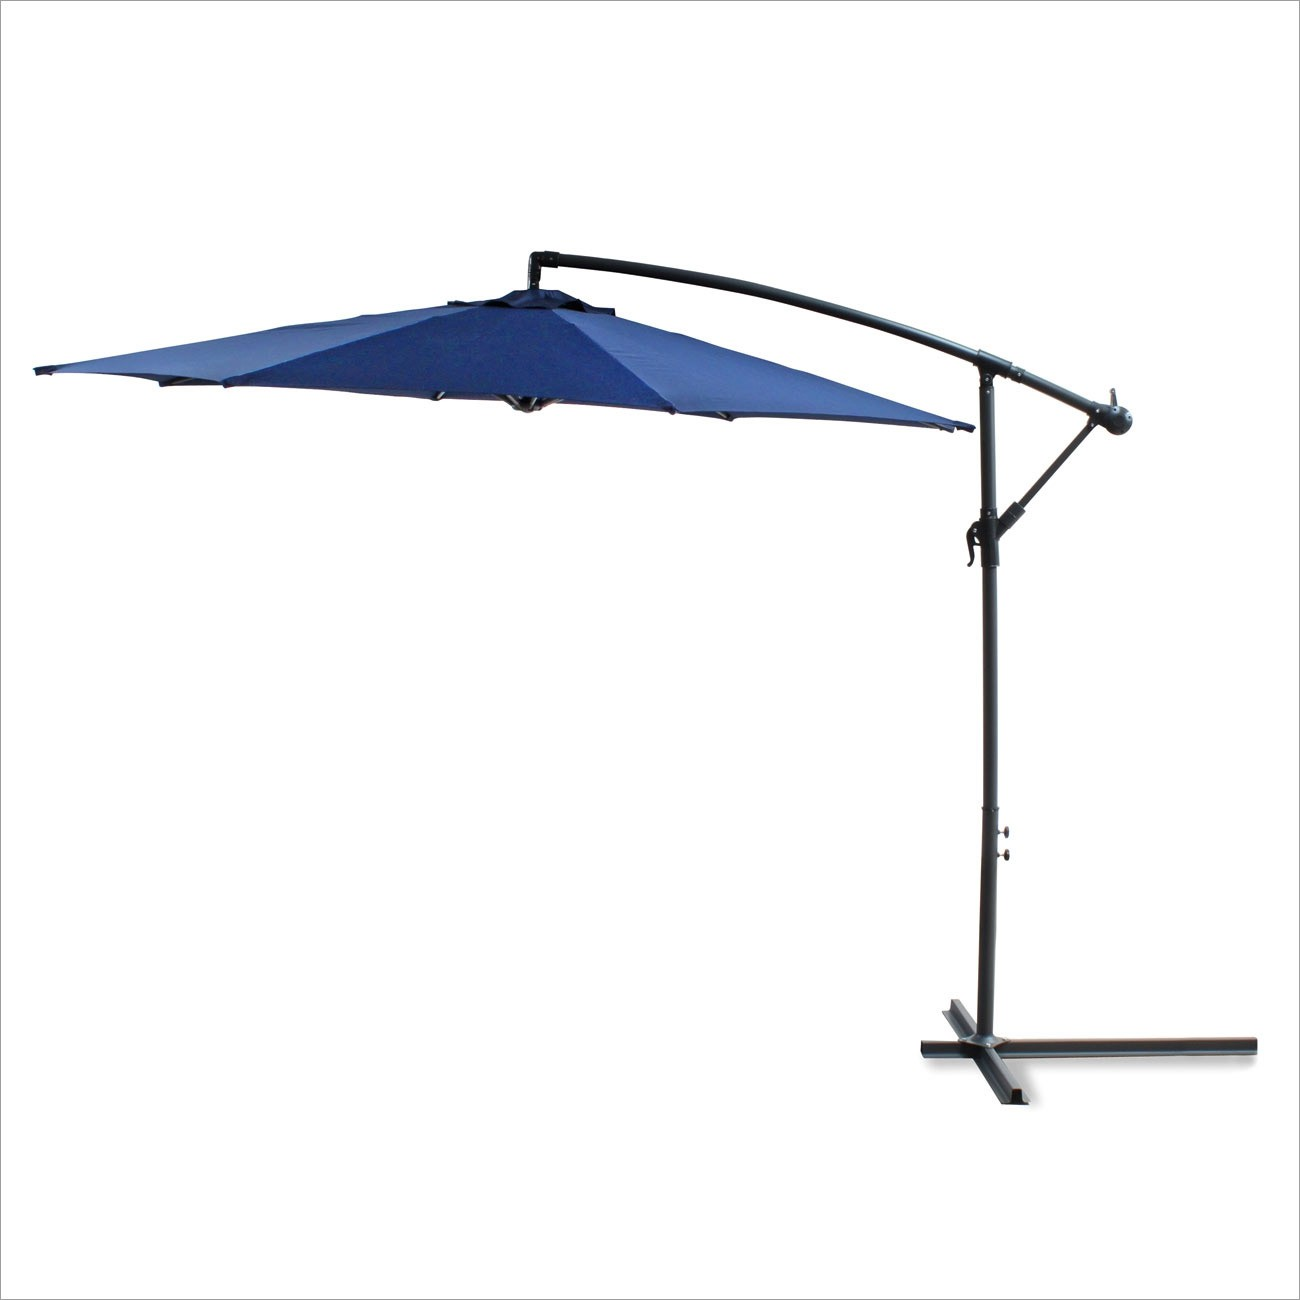 Dema Ampelschirm 3 Meter blau Sonnenschirm Gartenschirm Schirm Sonnenschutz 41157